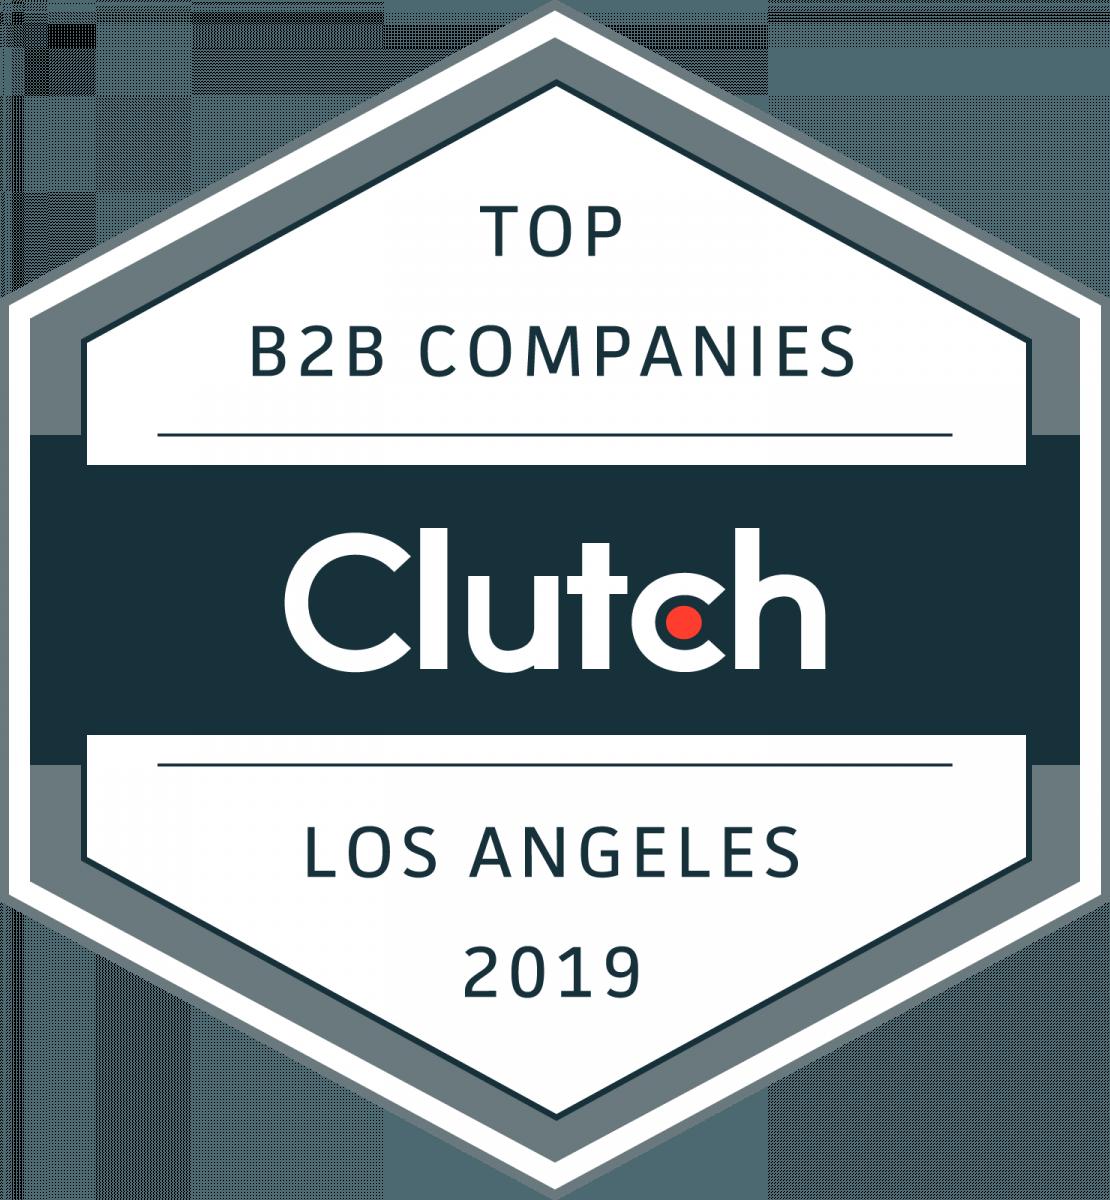 b2b companies losangeles 2019